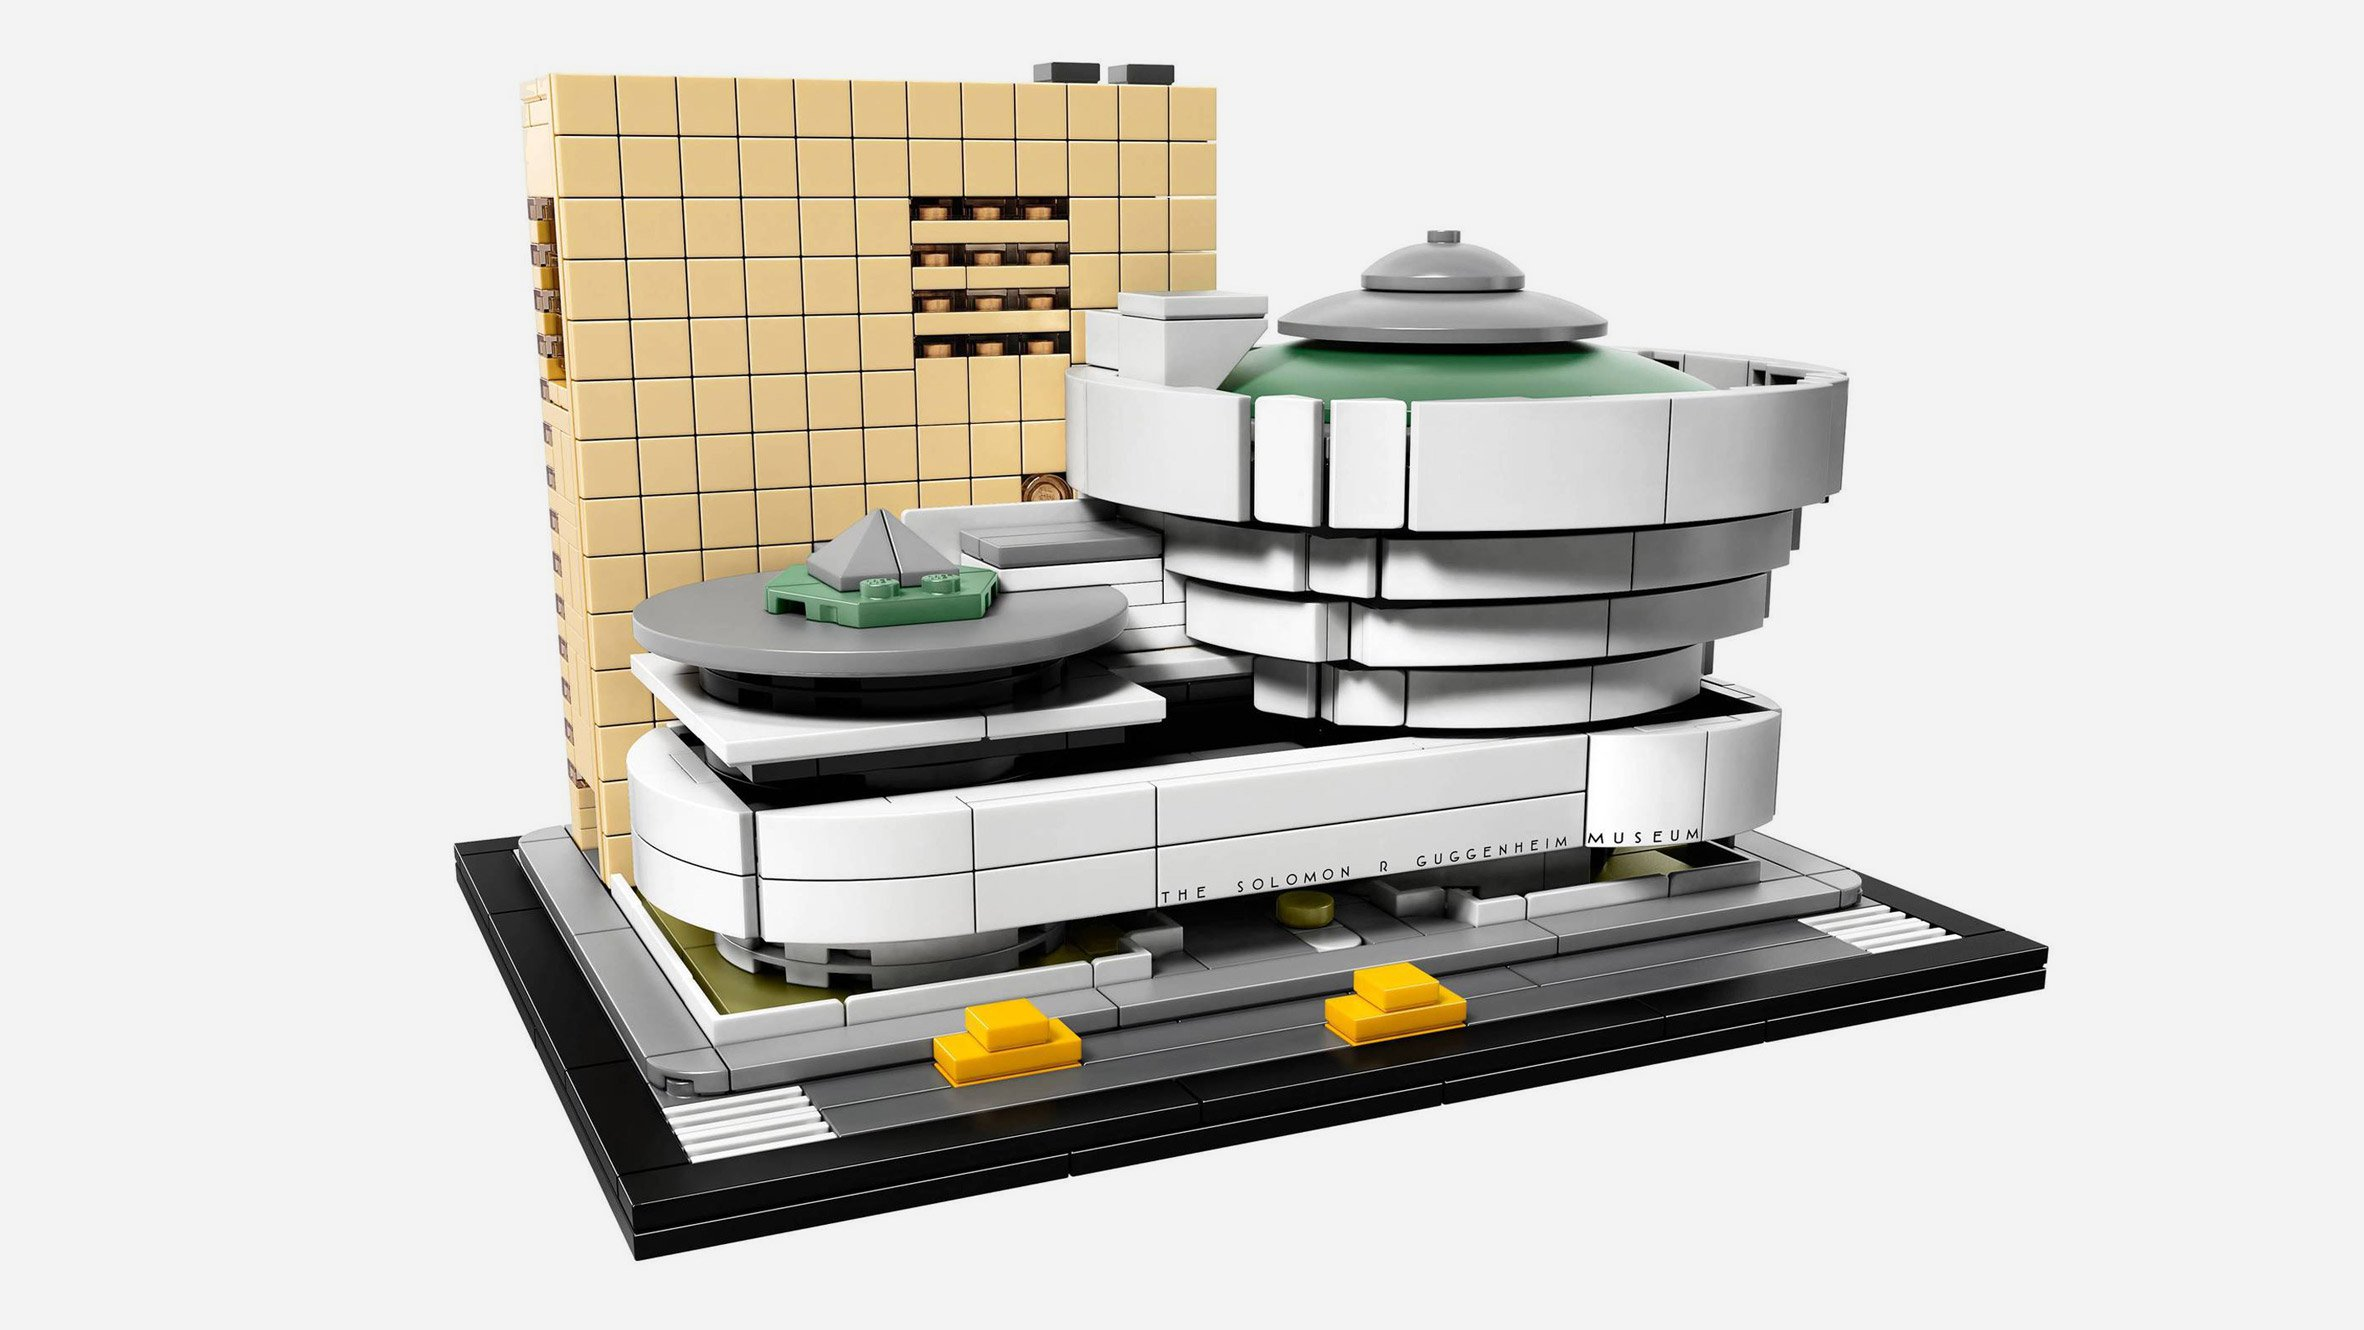 lego-guggenheim-news-design-products-toys-architecture-_dezeen_hero